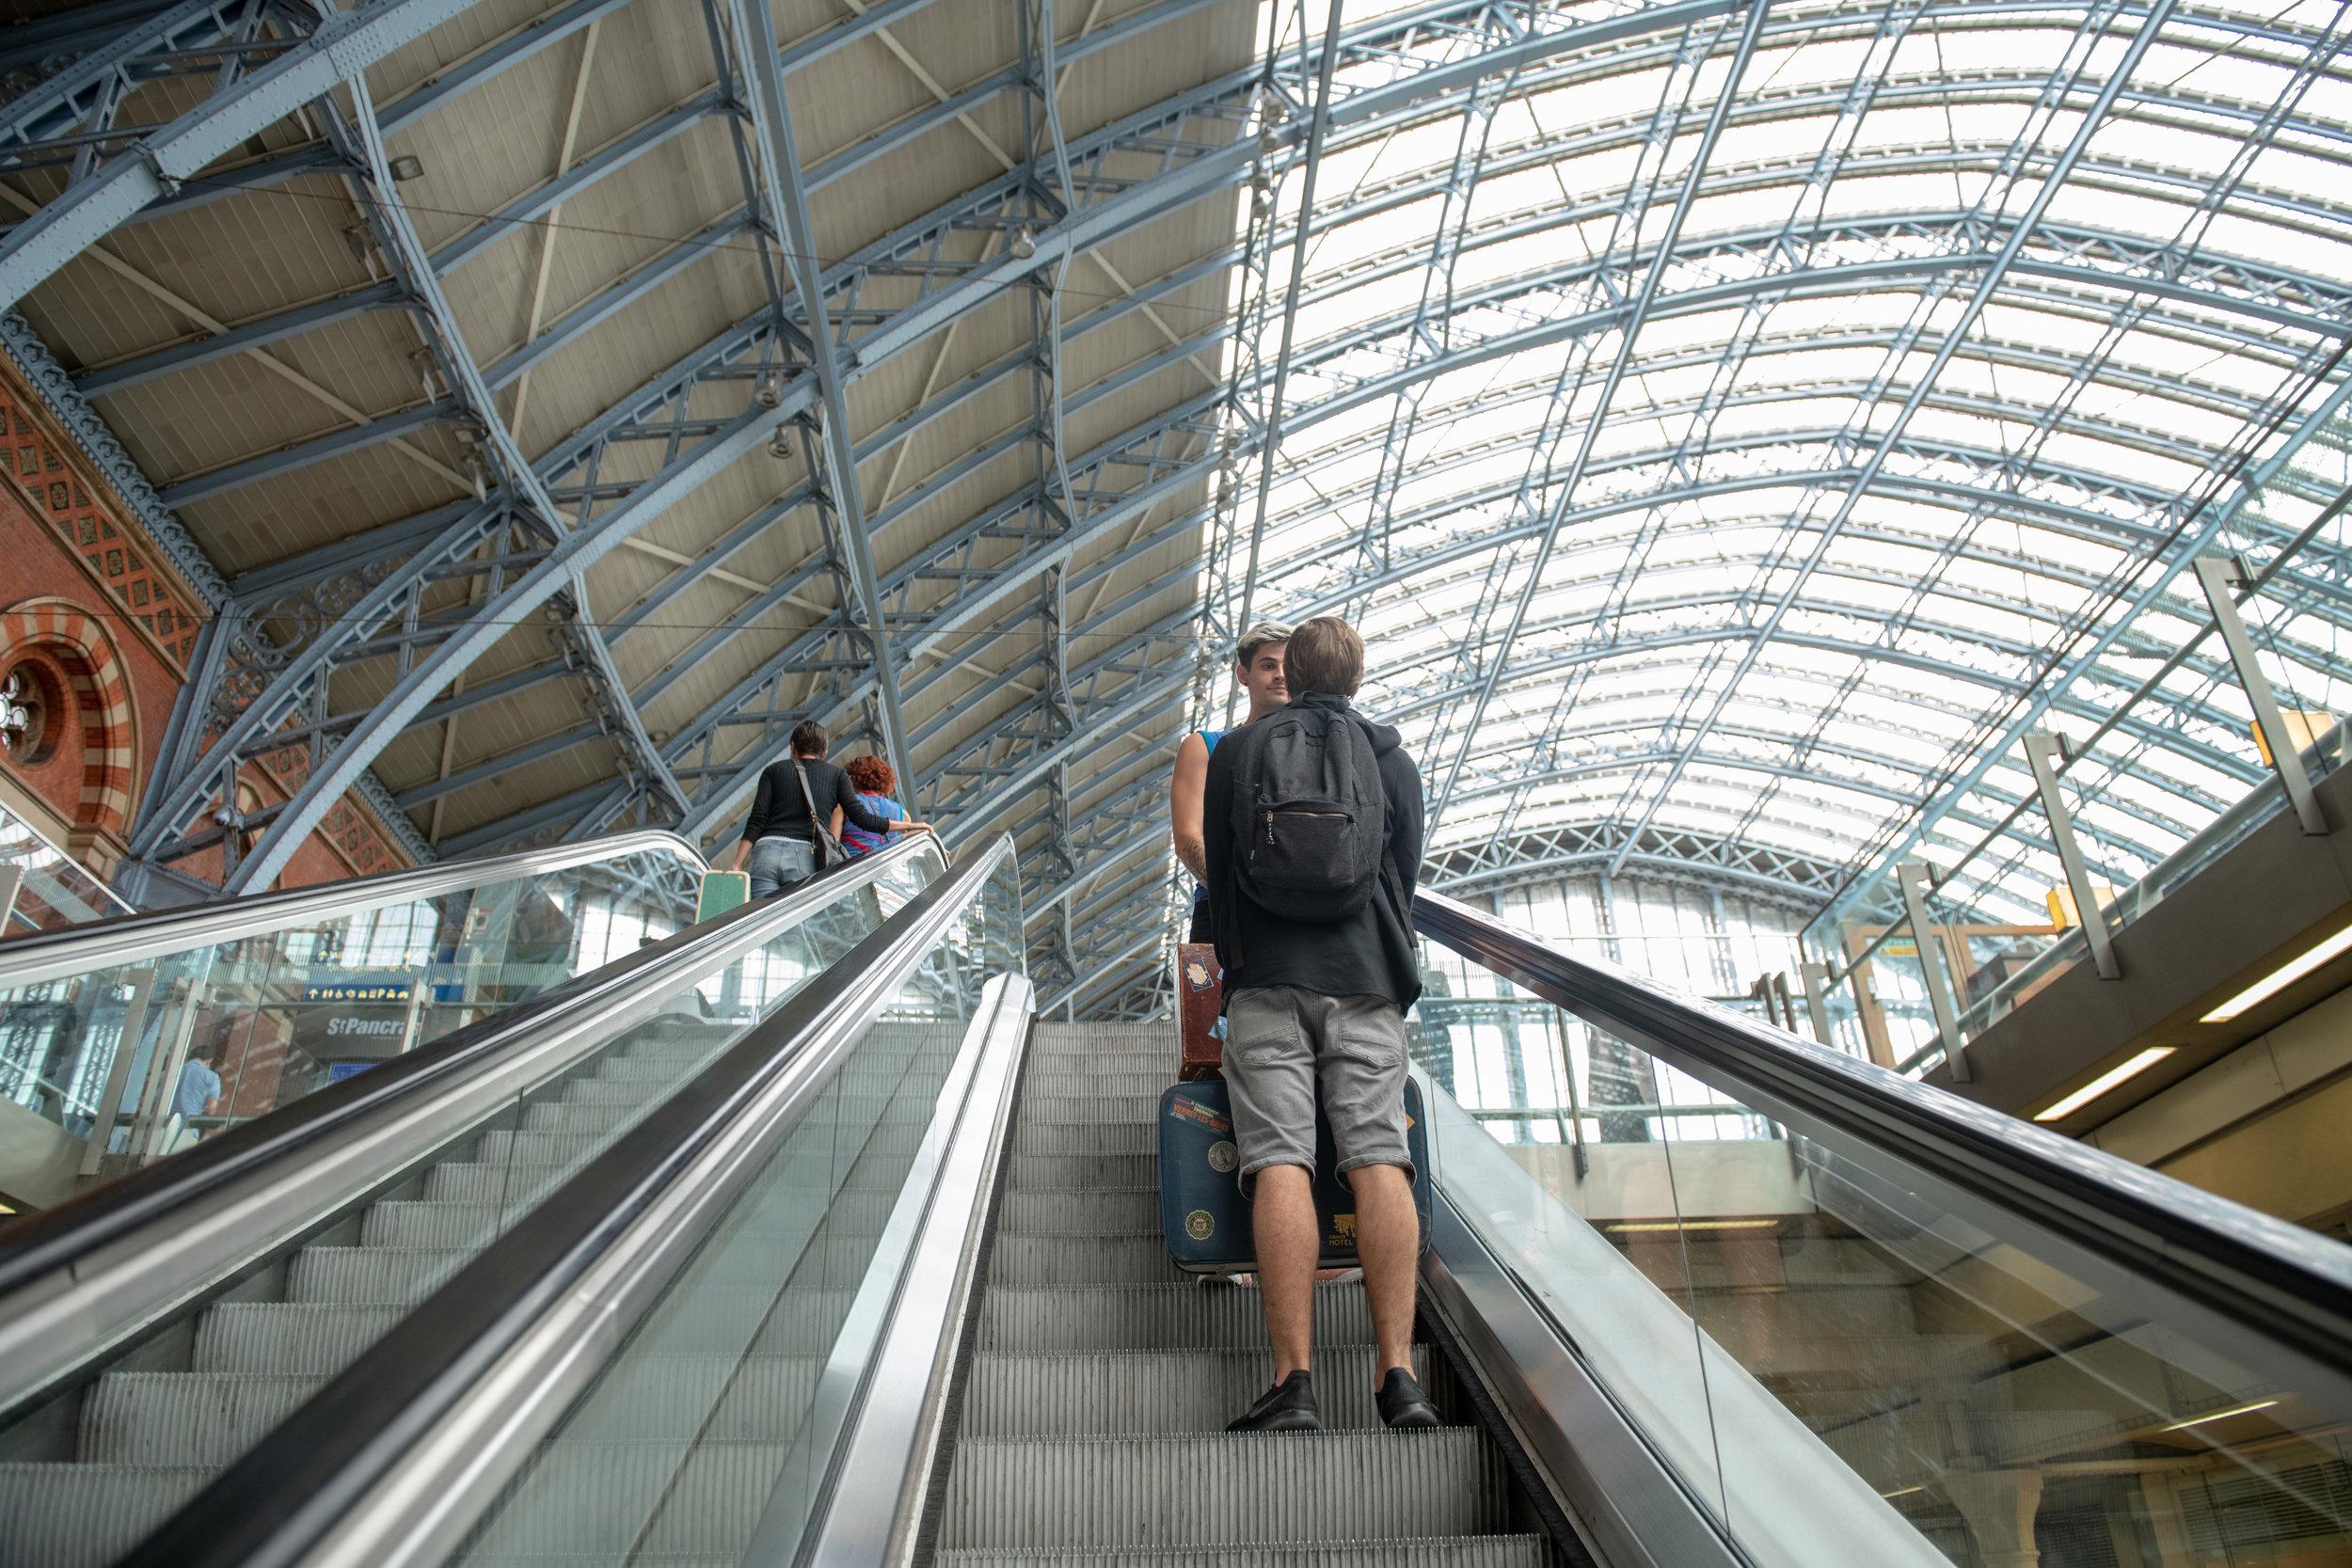 _Andrew on escalator.jpg